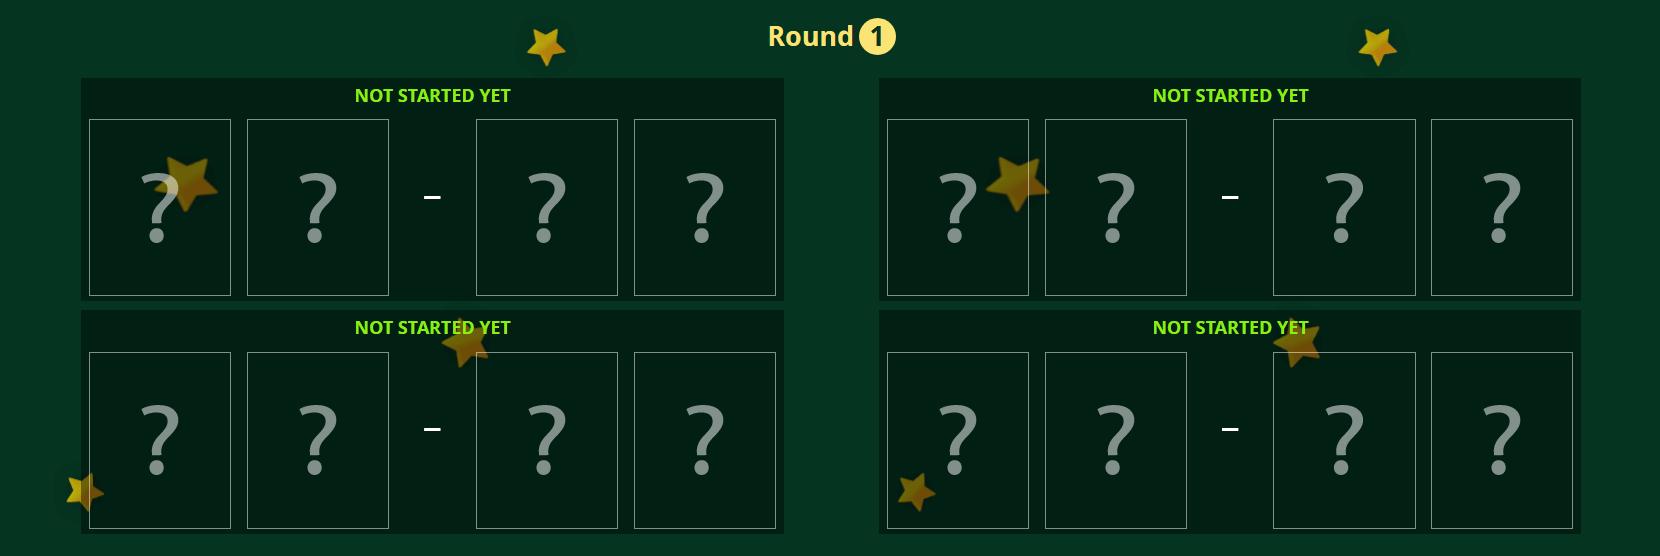 Tournament Round 1